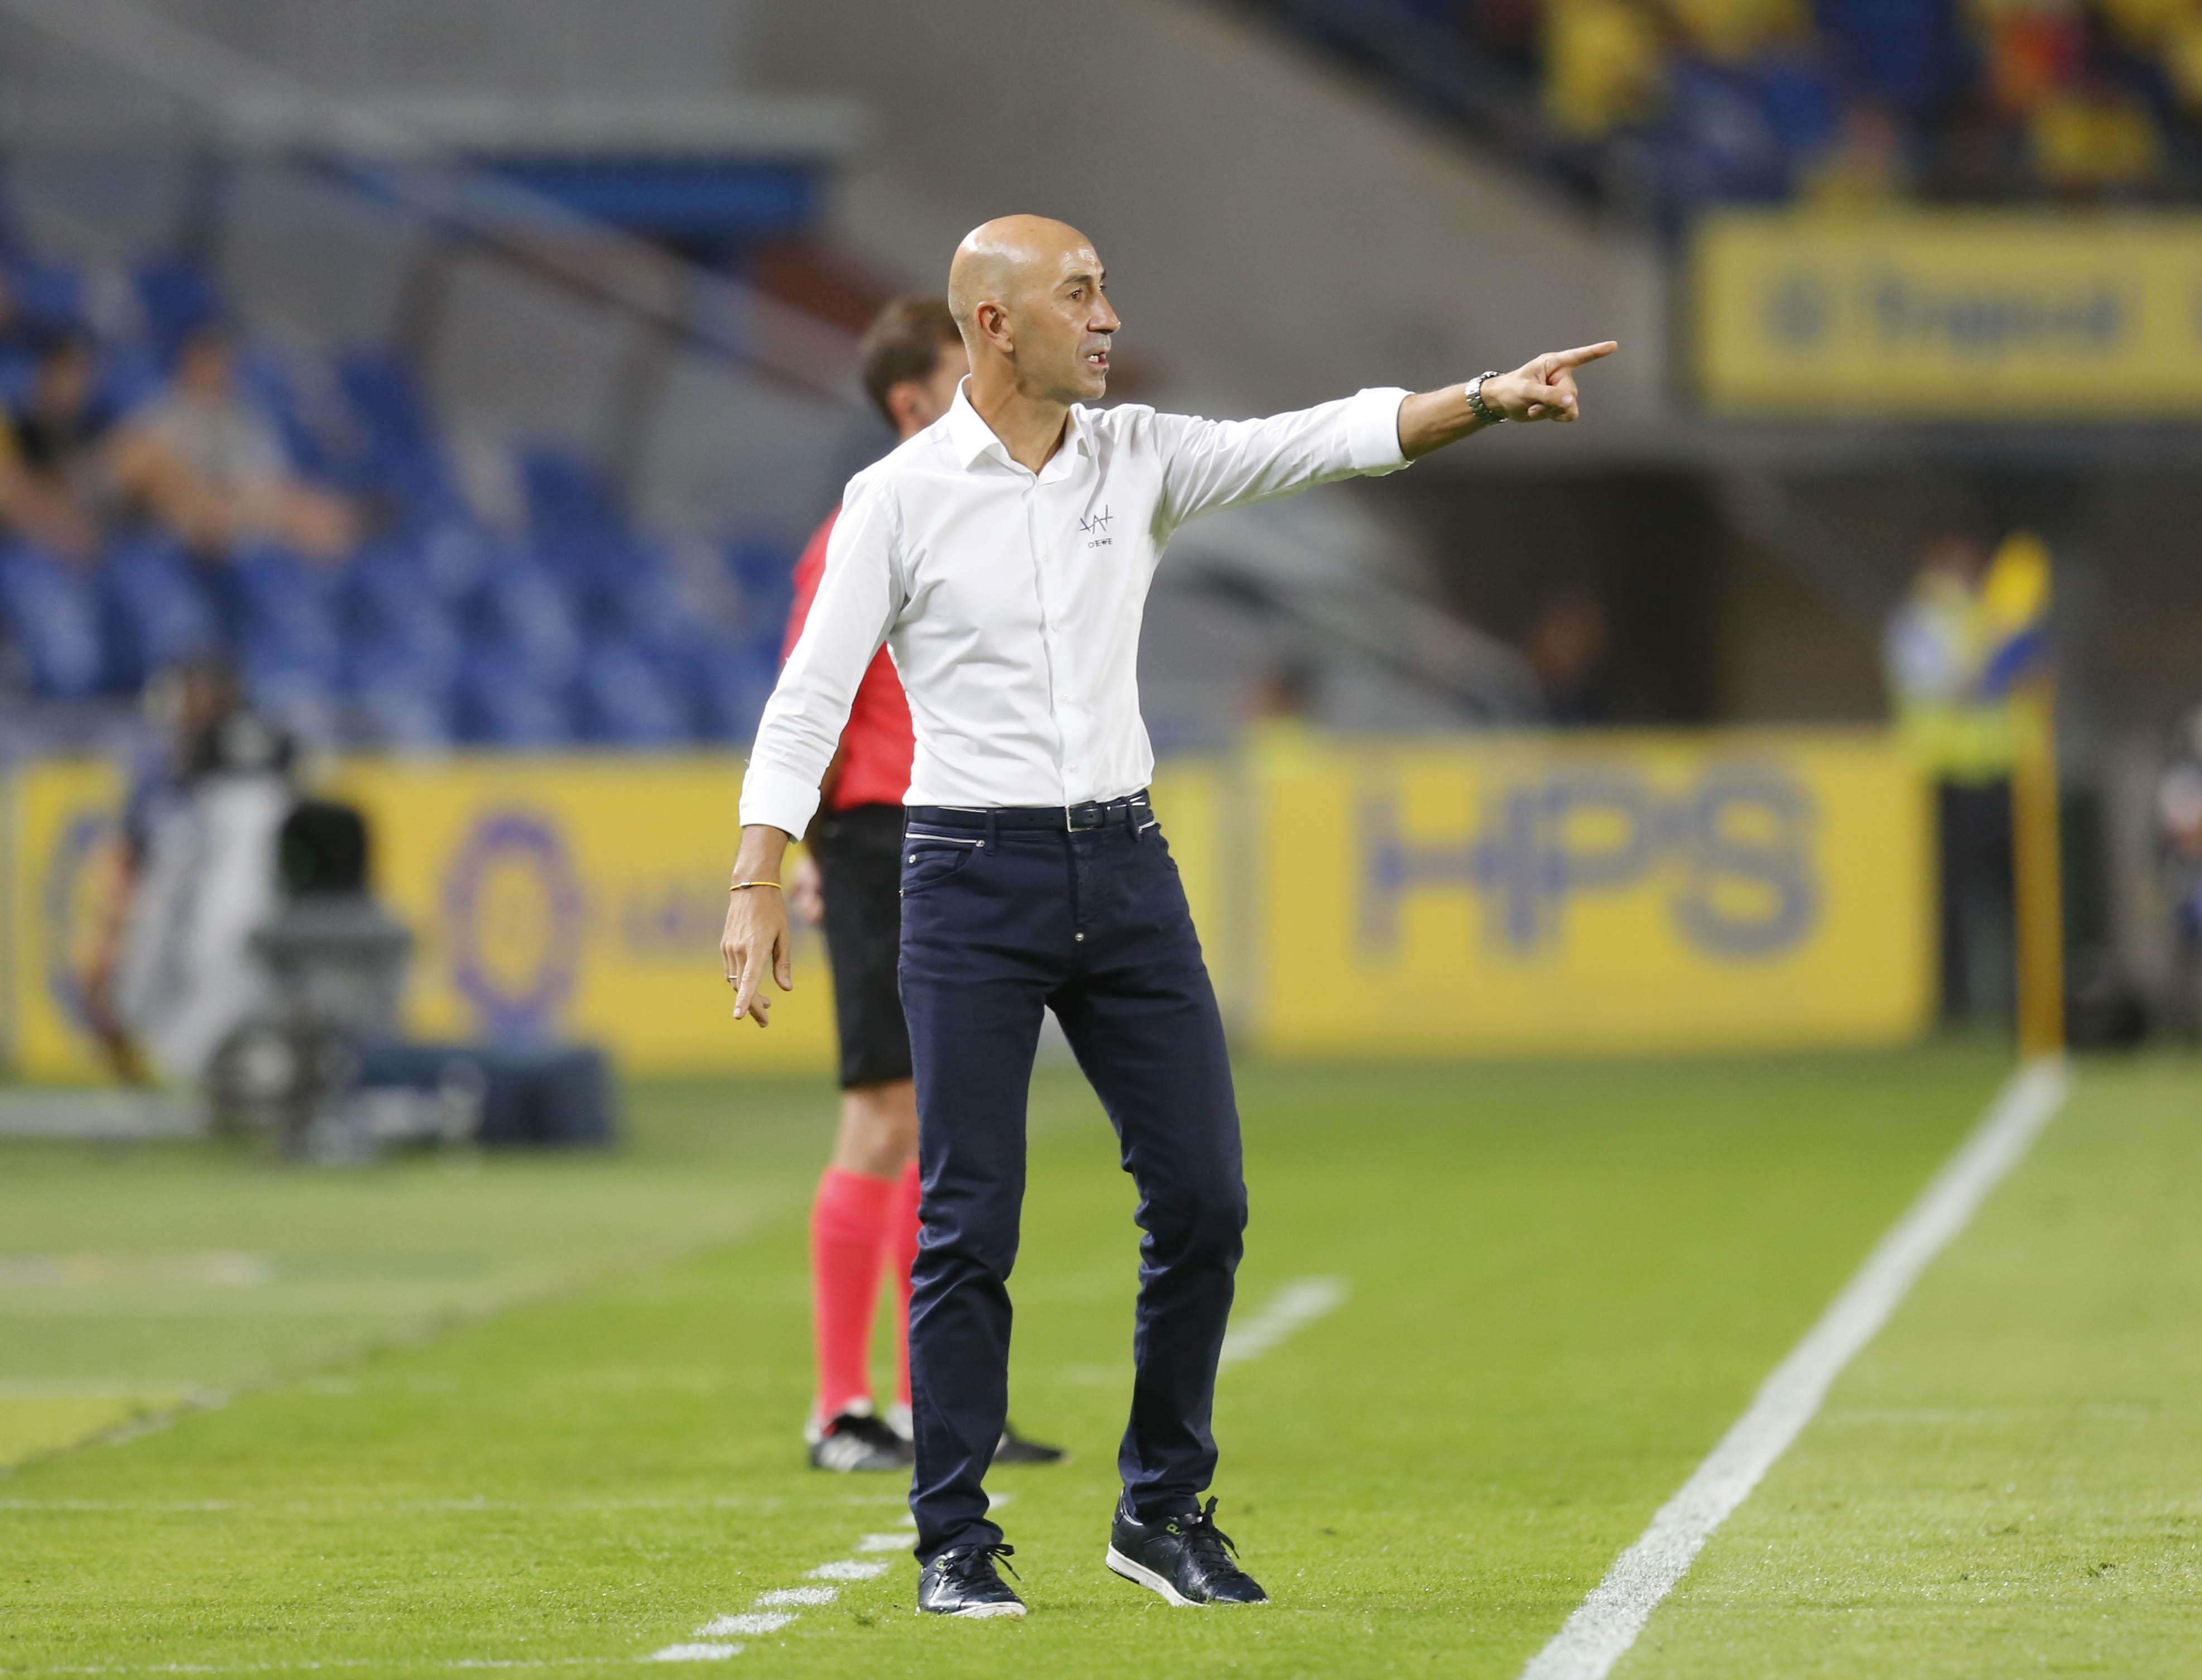 Pako Ayestarán guides Pachuca into Copa Mx quarters